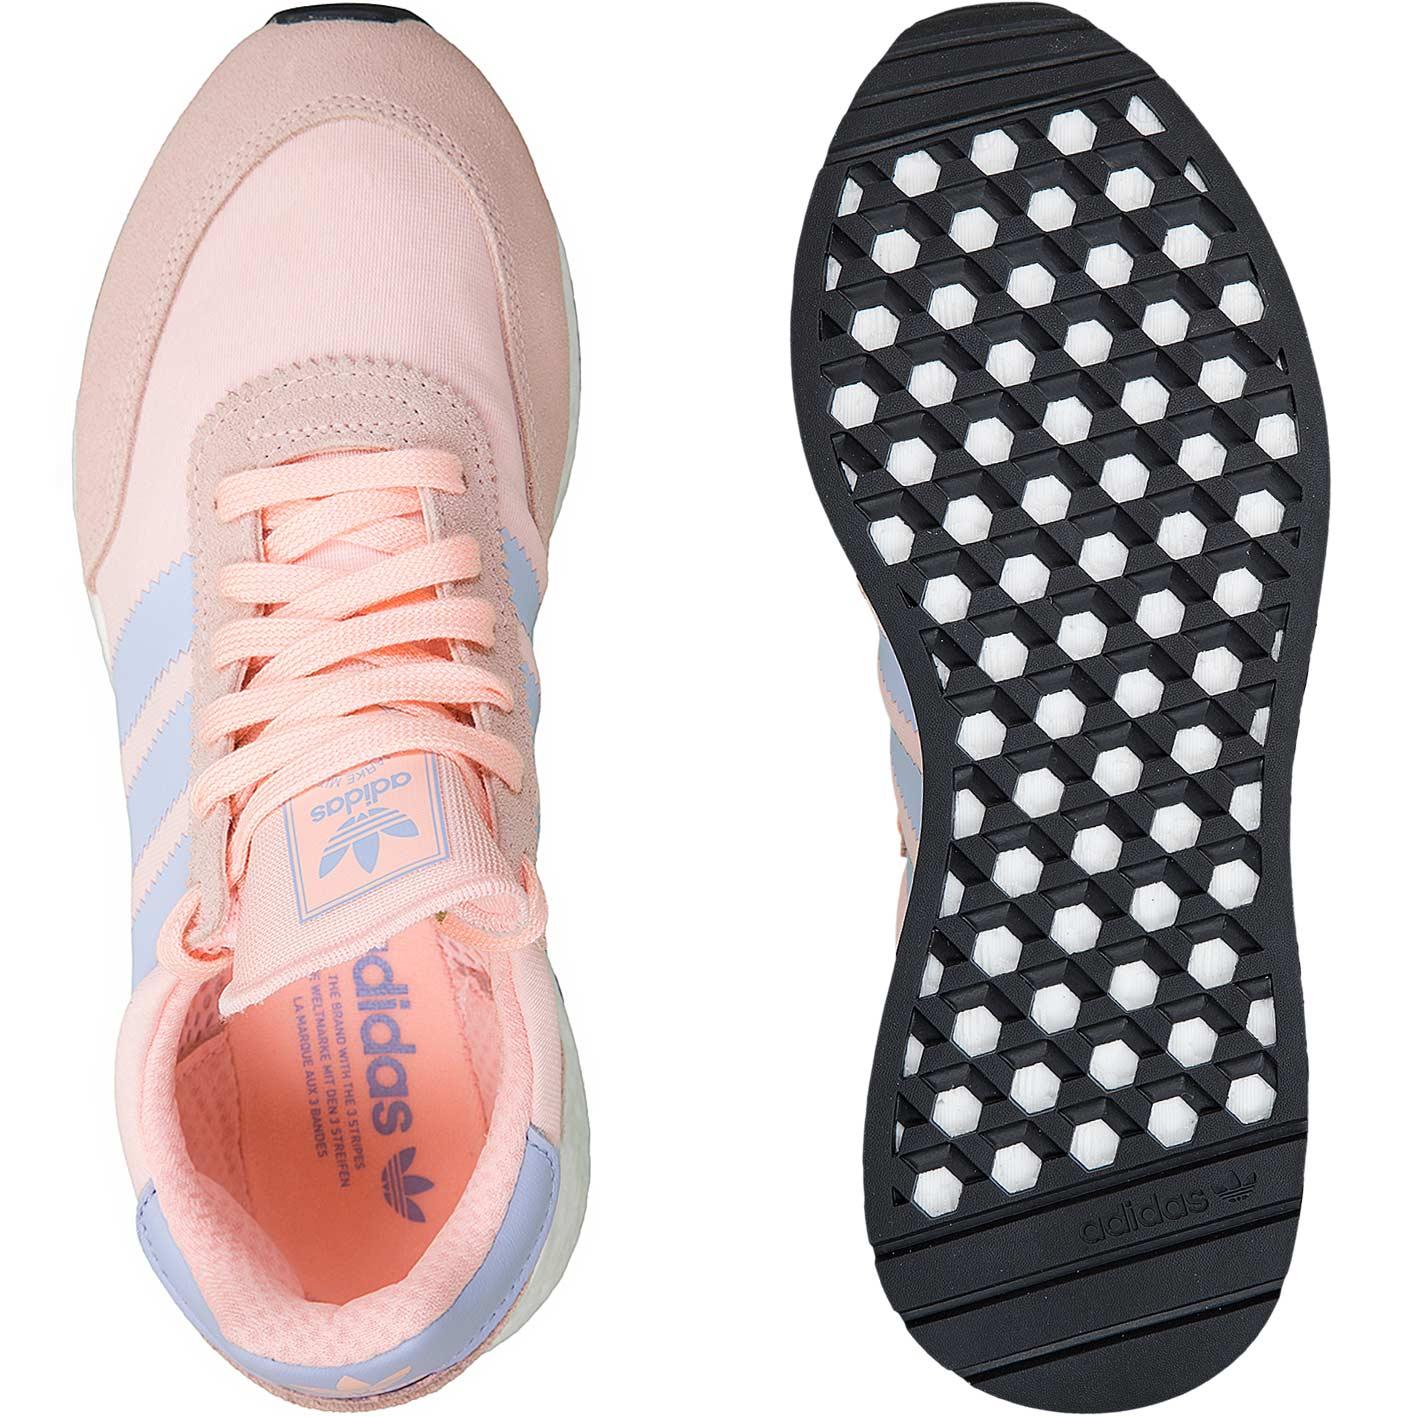 Adidas sneaker damen blau pink |